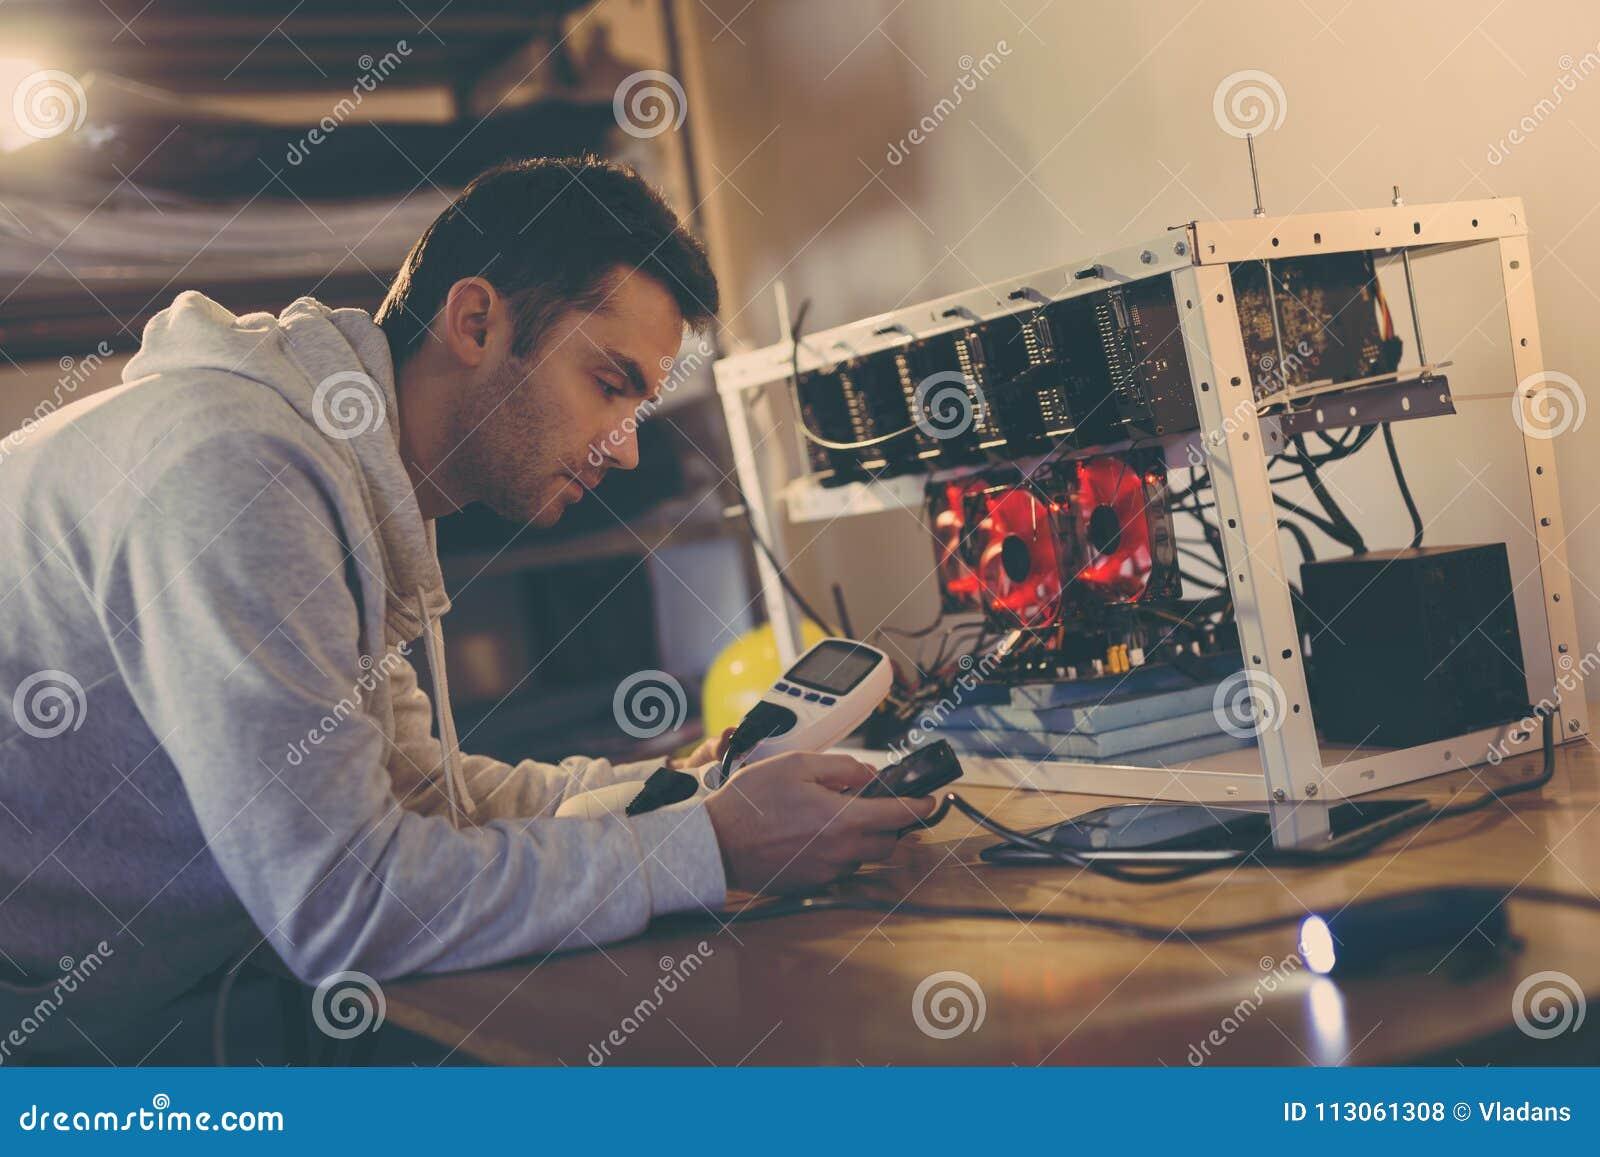 setting up cryptocurrency mining set up